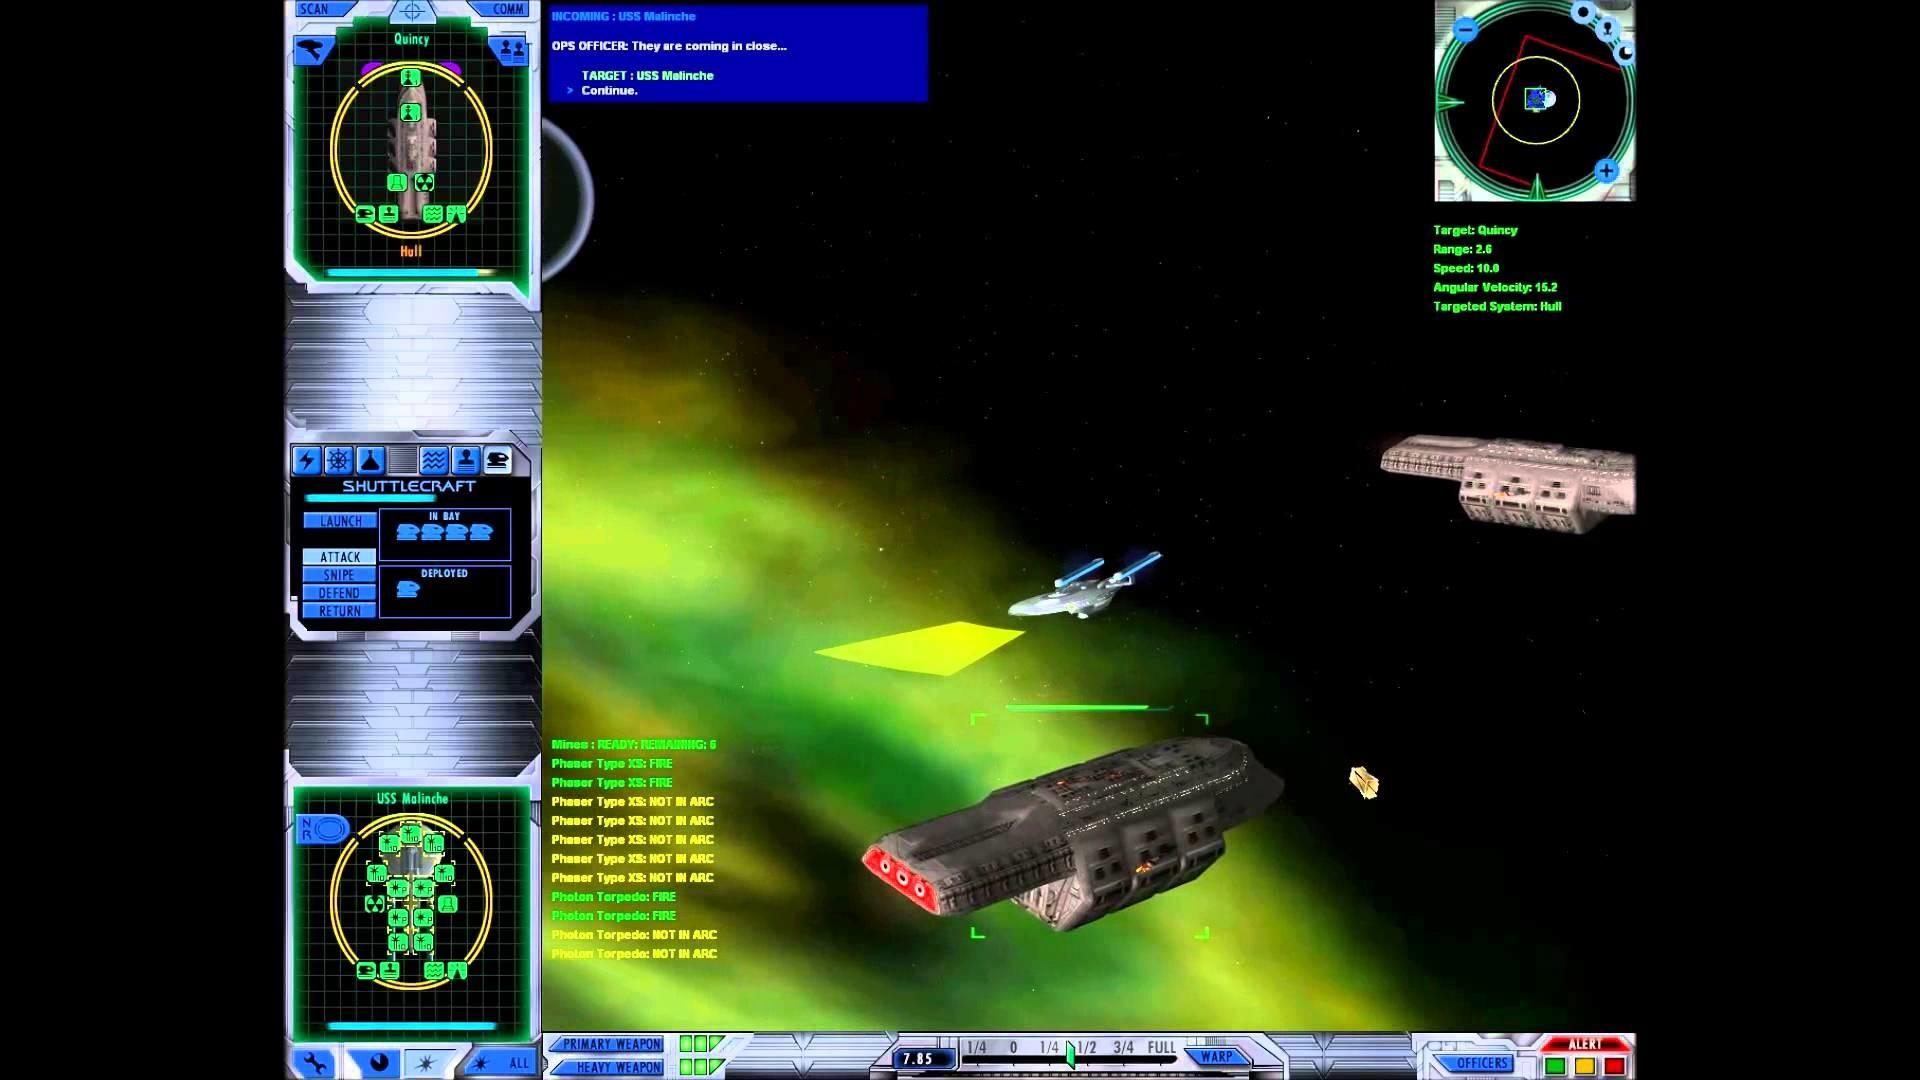 Starfleet Command Wallpaper (79+ images)